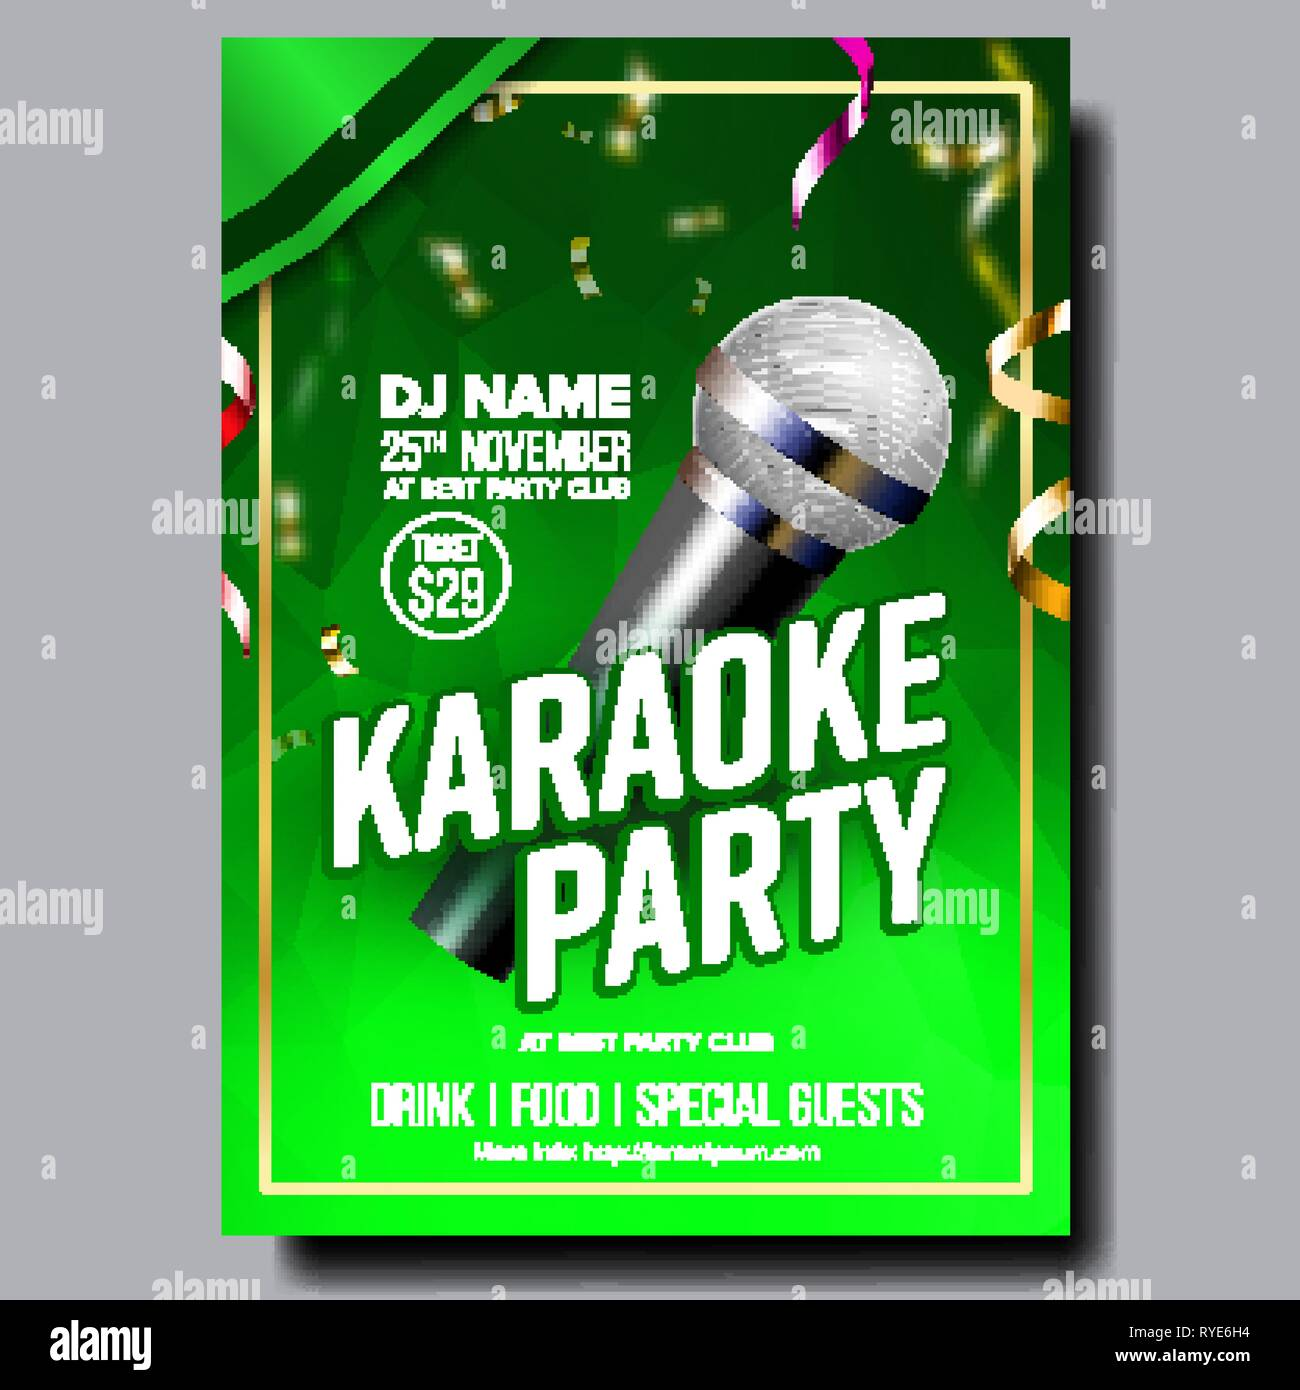 Karaoke Poster Vector. Retro Concert. Karaoke Club Background. Mic Design. Creative Layout. Audio Element. Speaker Label. Entertainment Competition - Stock Vector